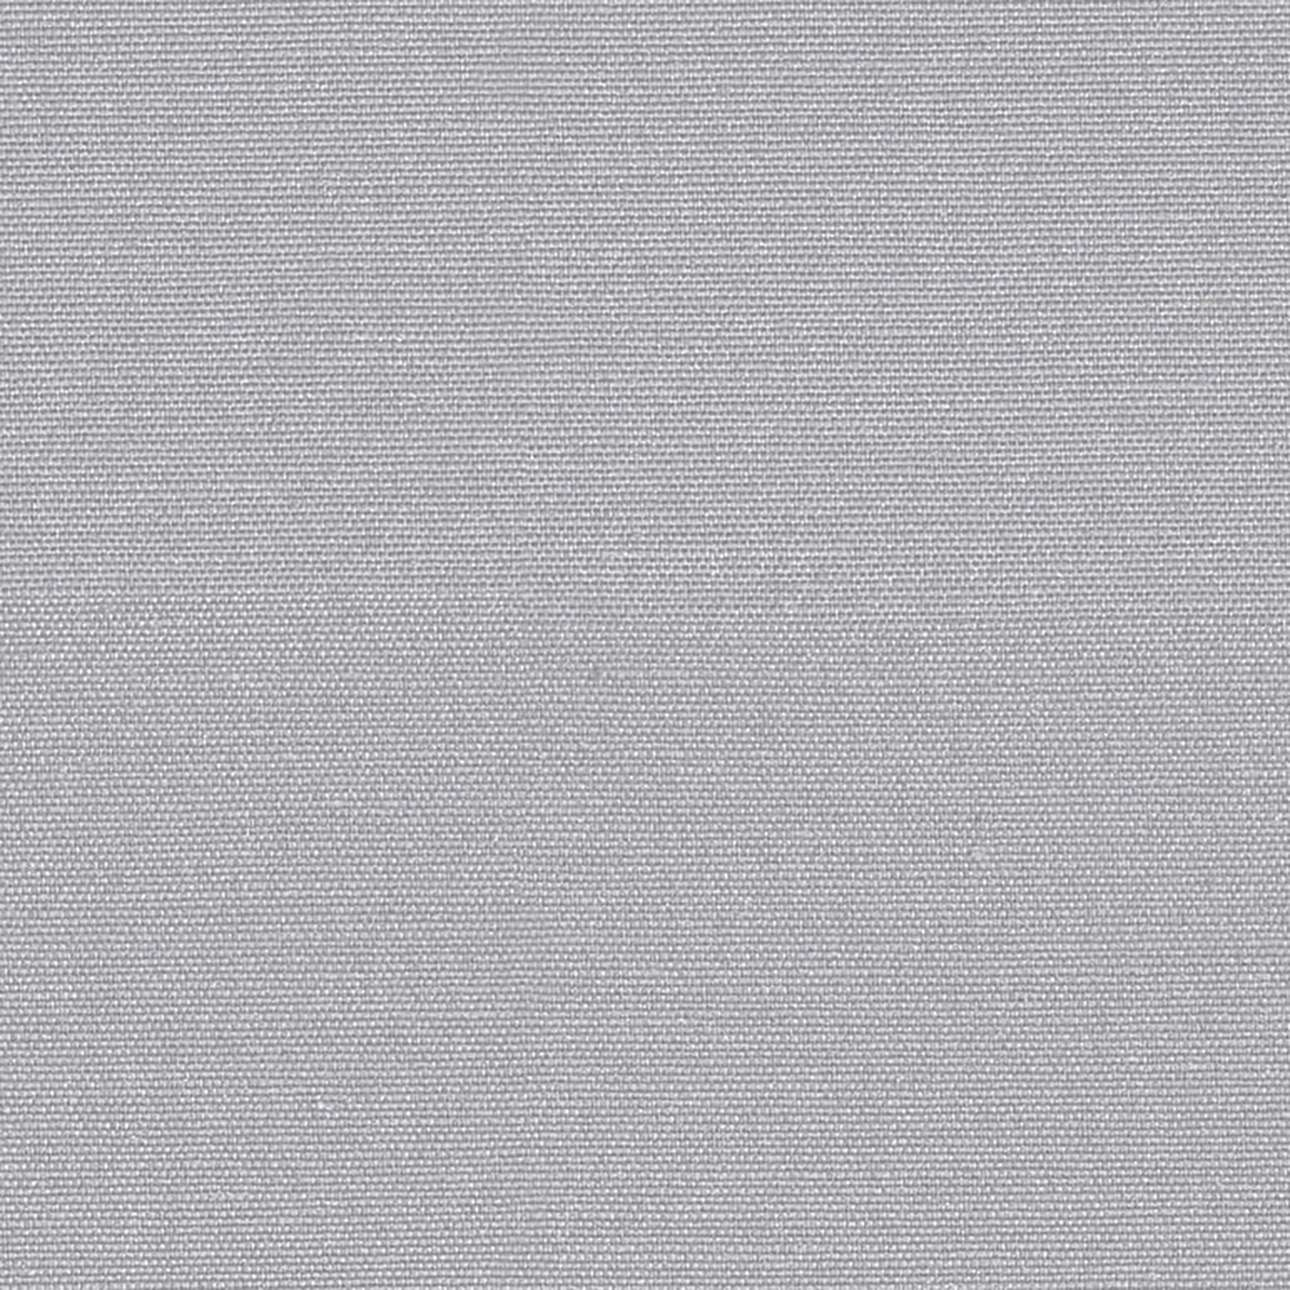 Zasłona na kółkach 1 szt. w kolekcji Jupiter, tkanina: 127-92